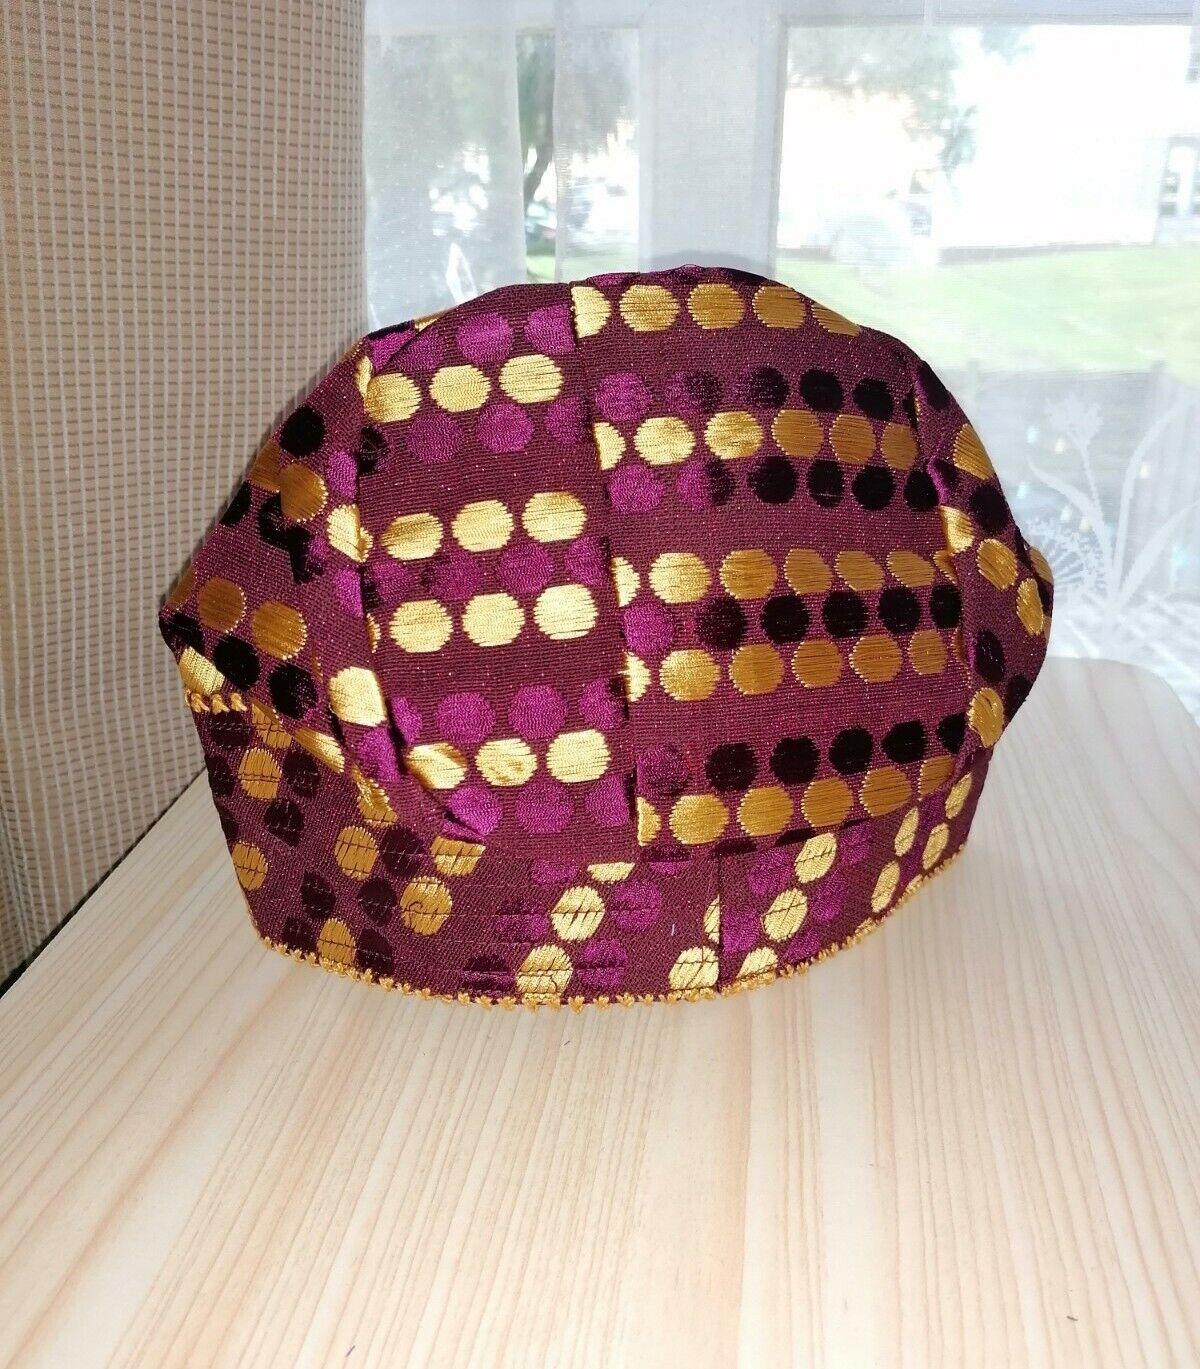 NEW NIGERIA Aso Oke Men's CAP(FILA) MAROON & GOLDCOLOUR. SIZE 22.5 inches